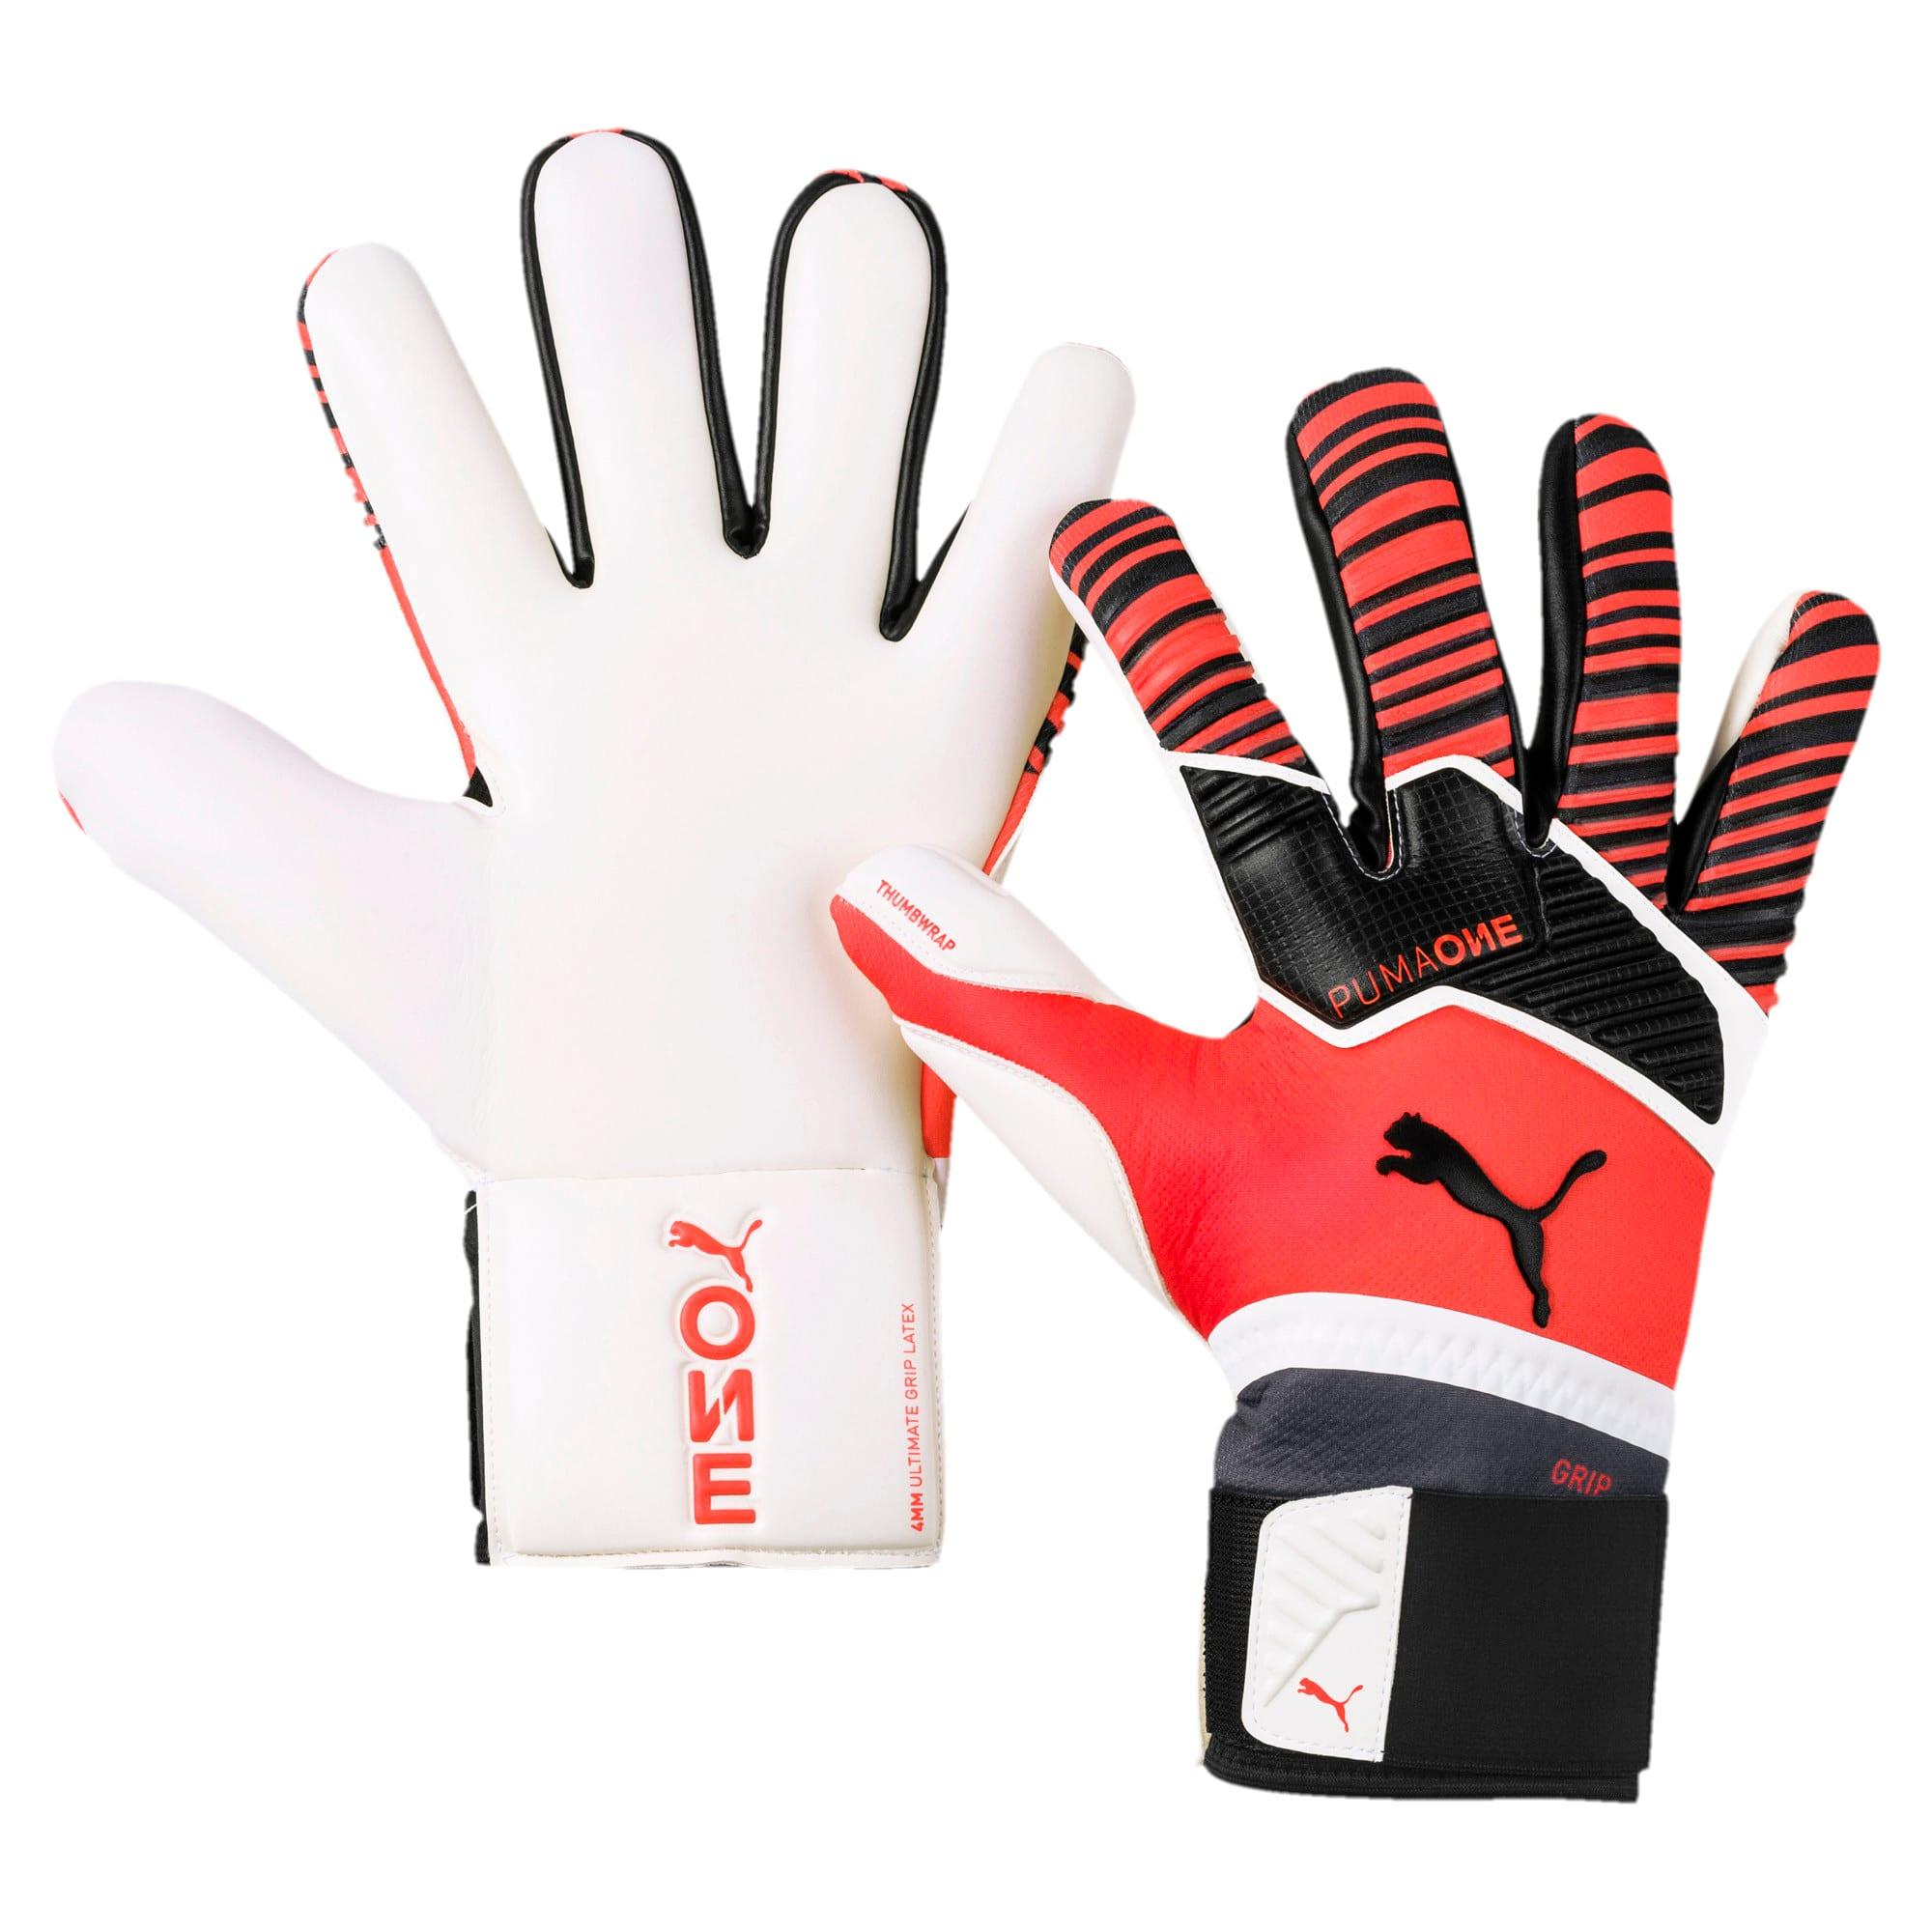 PUMA One Grip 1 Hybrid Pro Goalkeeper Gloves, Nero/Rosso/Bianco, Taglia 7